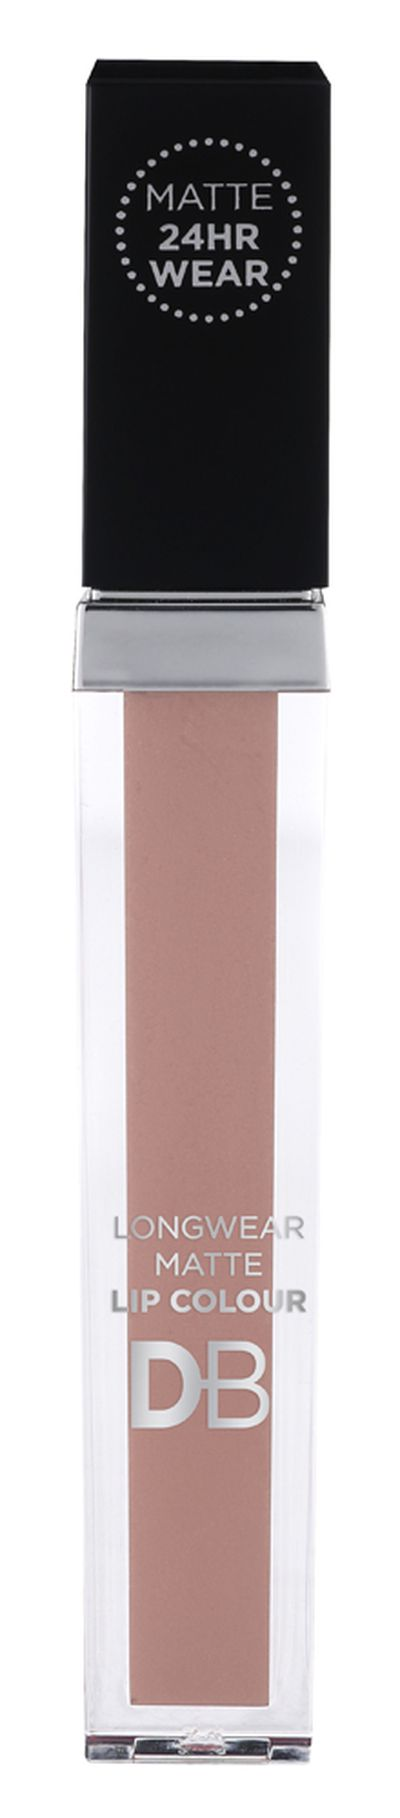 "<p><strong><a href=""https://www.dbcosmetics.com.au/matte-longwear-lip-gloss"" target=""_blank"" draggable=""false"">DB Longwear Lip Colour</a></strong>, $9.99</p> <p>""Dusty Nude is the best.""</p>"